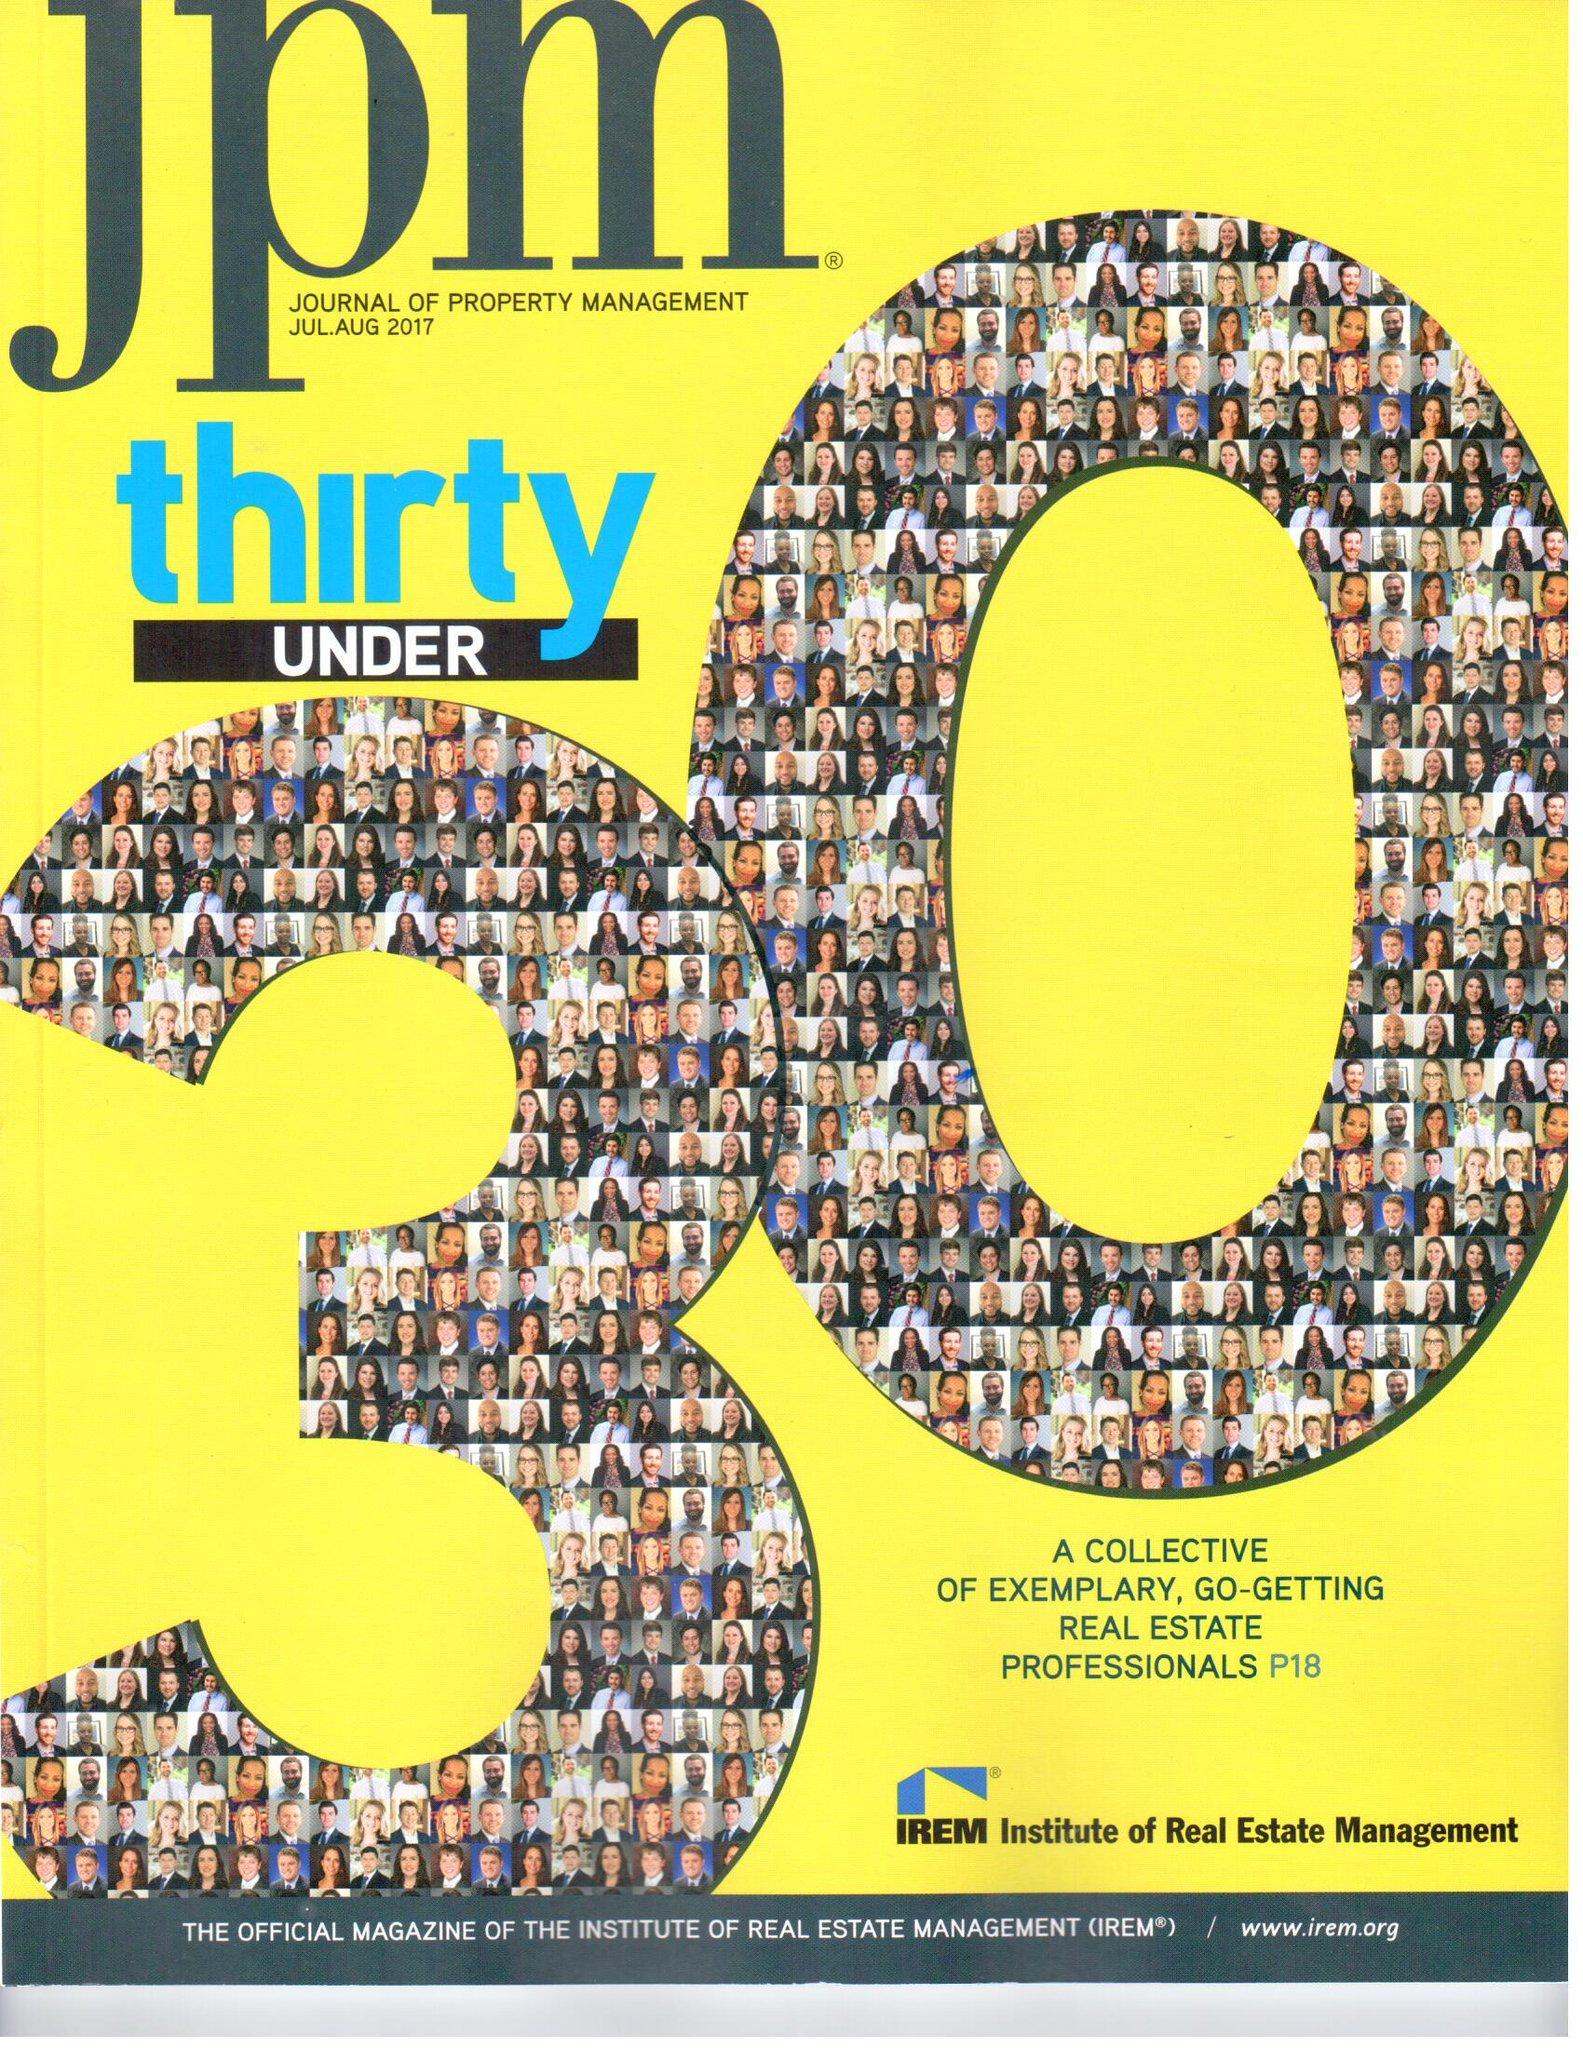 Tm associates rockville md - Tm Associates On Twitter Congrats To Tm S Noah Hale As A 30 Under 30 Recipient In The Journal Of Property Management